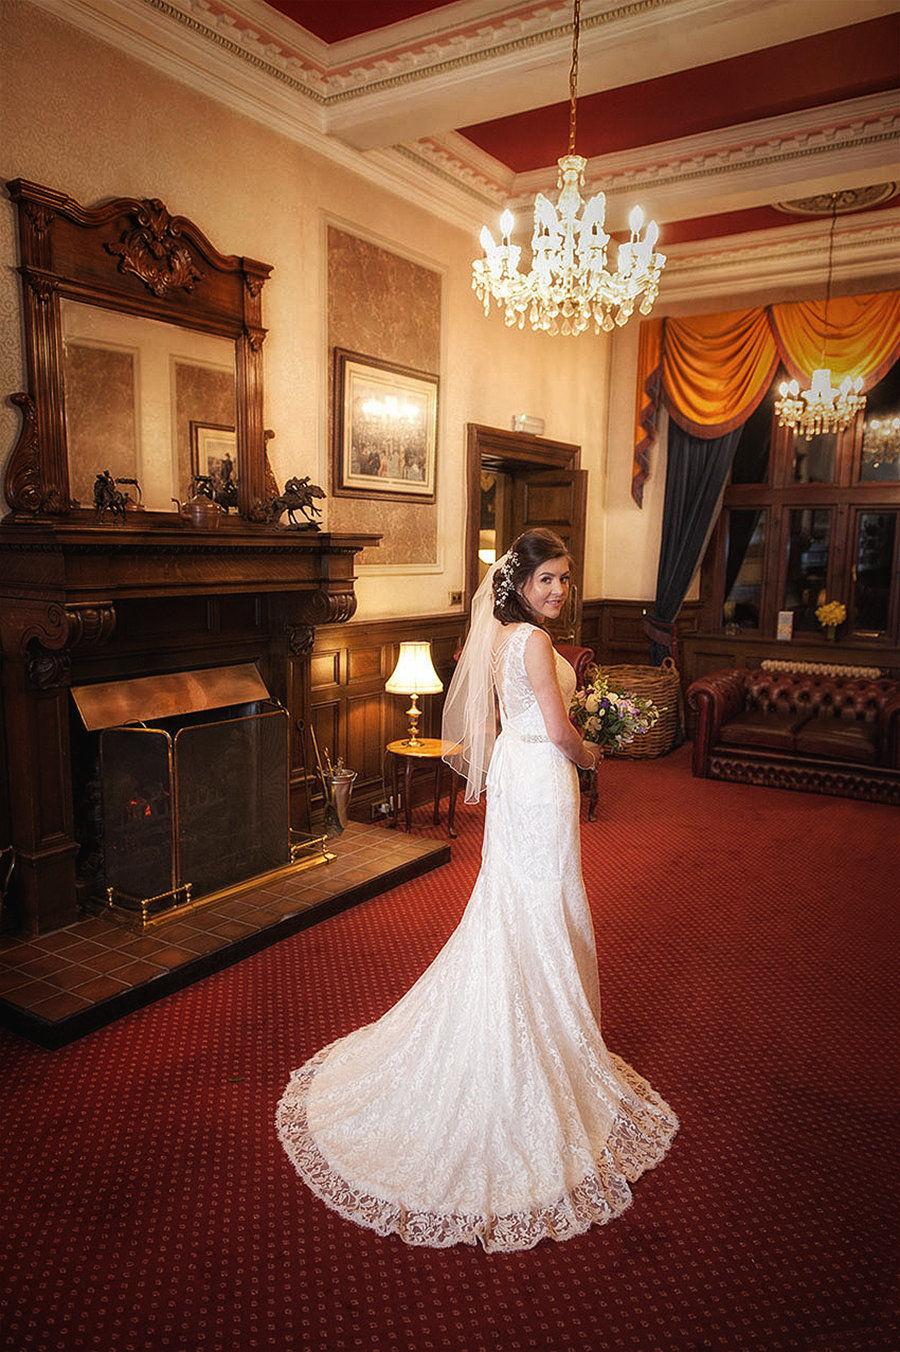 West Yorkshire wedding photography by Eternity Photo Ltd.  Bridal shoot.